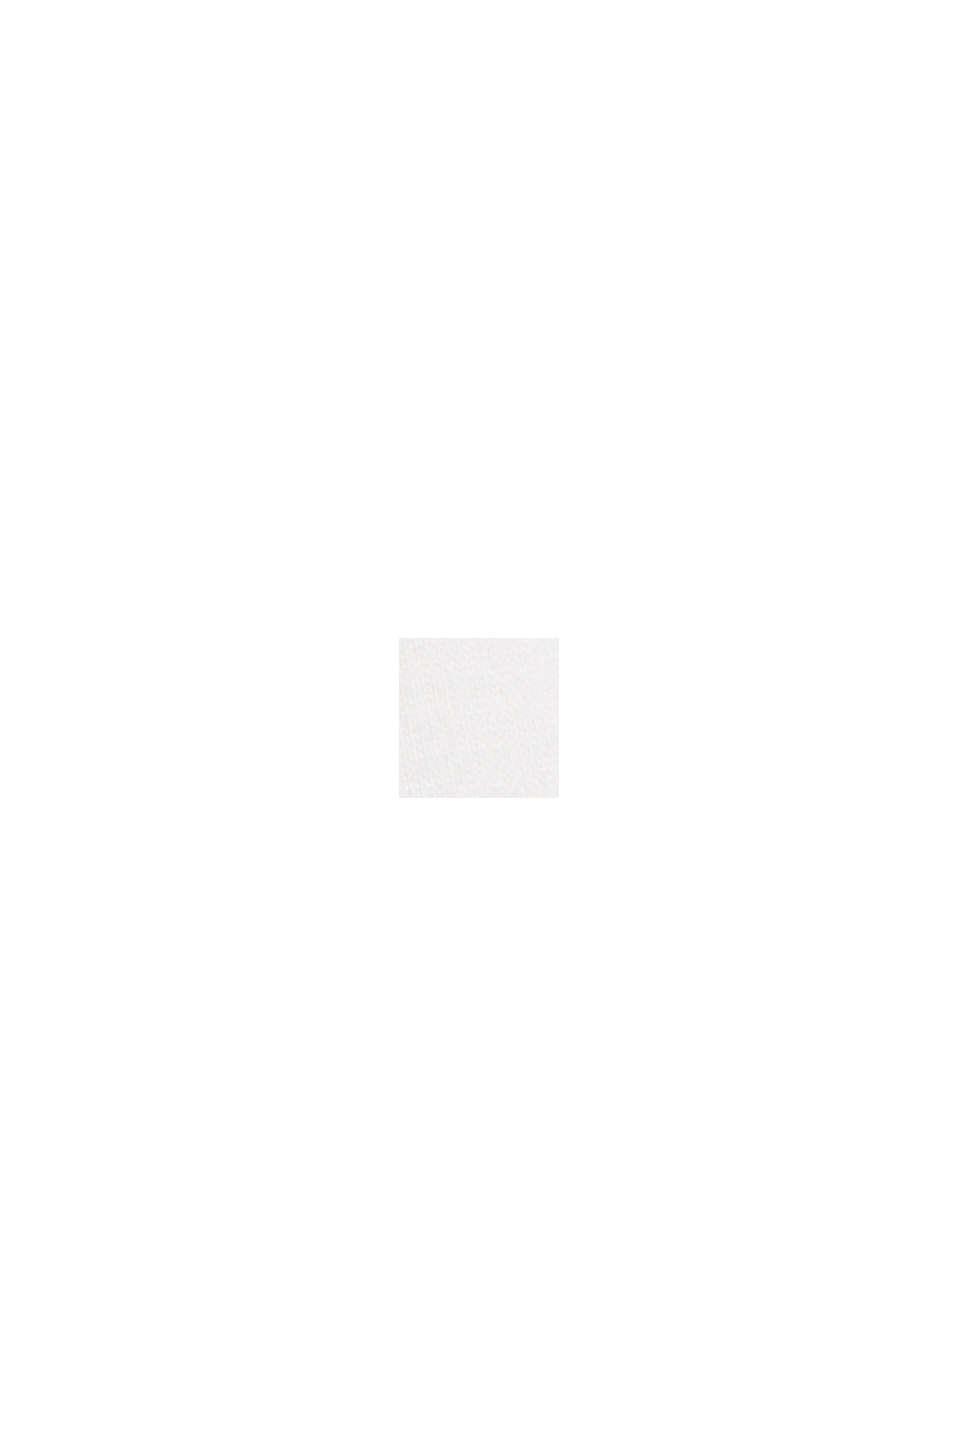 T-shirt en jersey à la technologie COOLMAX®, OFF WHITE, swatch